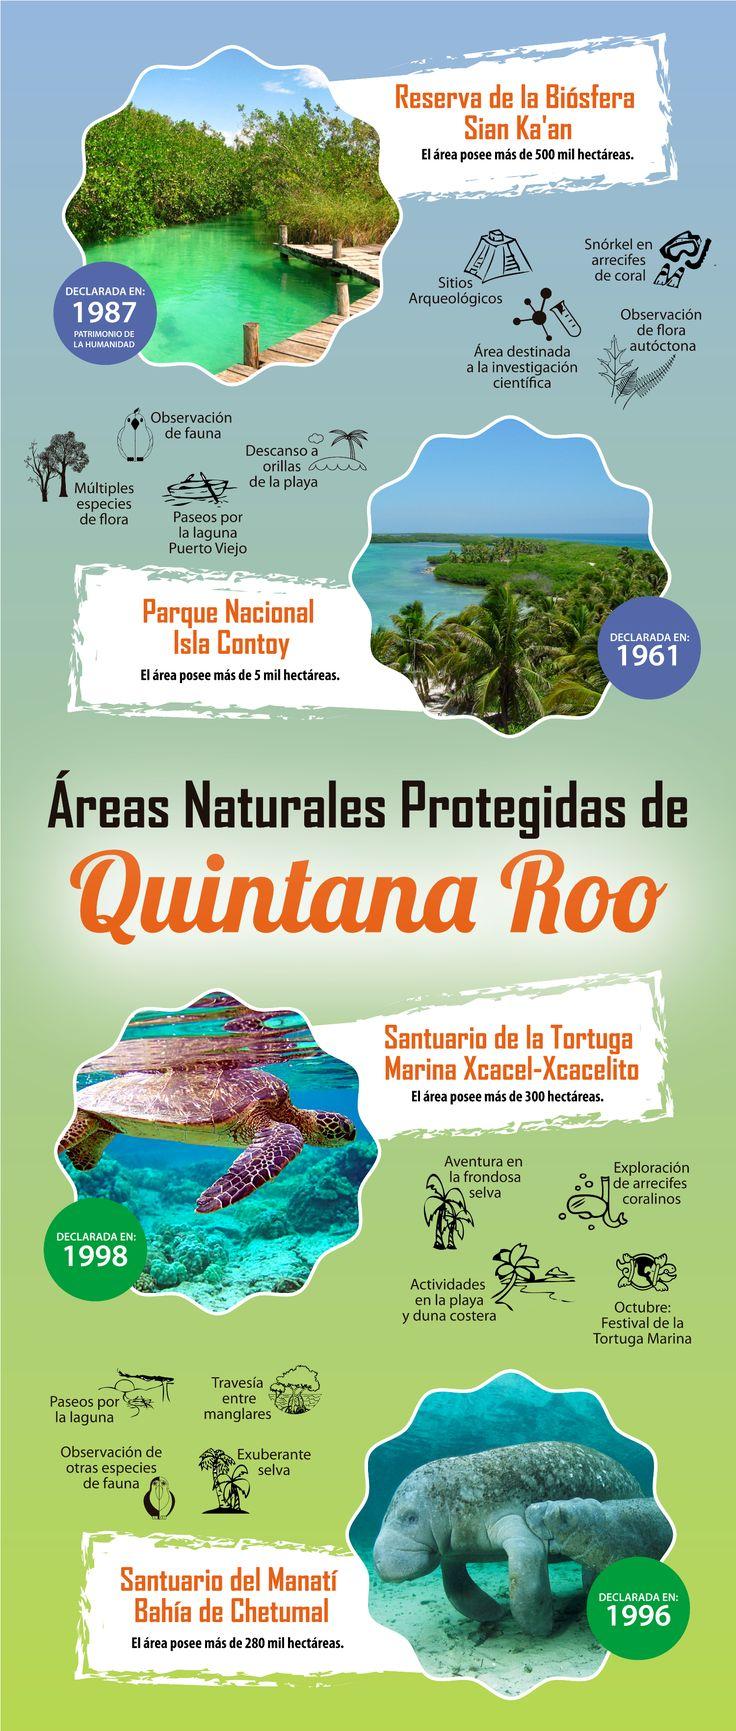 Las #Areas #Naturales Protegidas de #QuintanaRoo ¡logran enamorar a primera vista! Descúbrelas en esta #infografia http://www.bestday.com.mx/Tours/